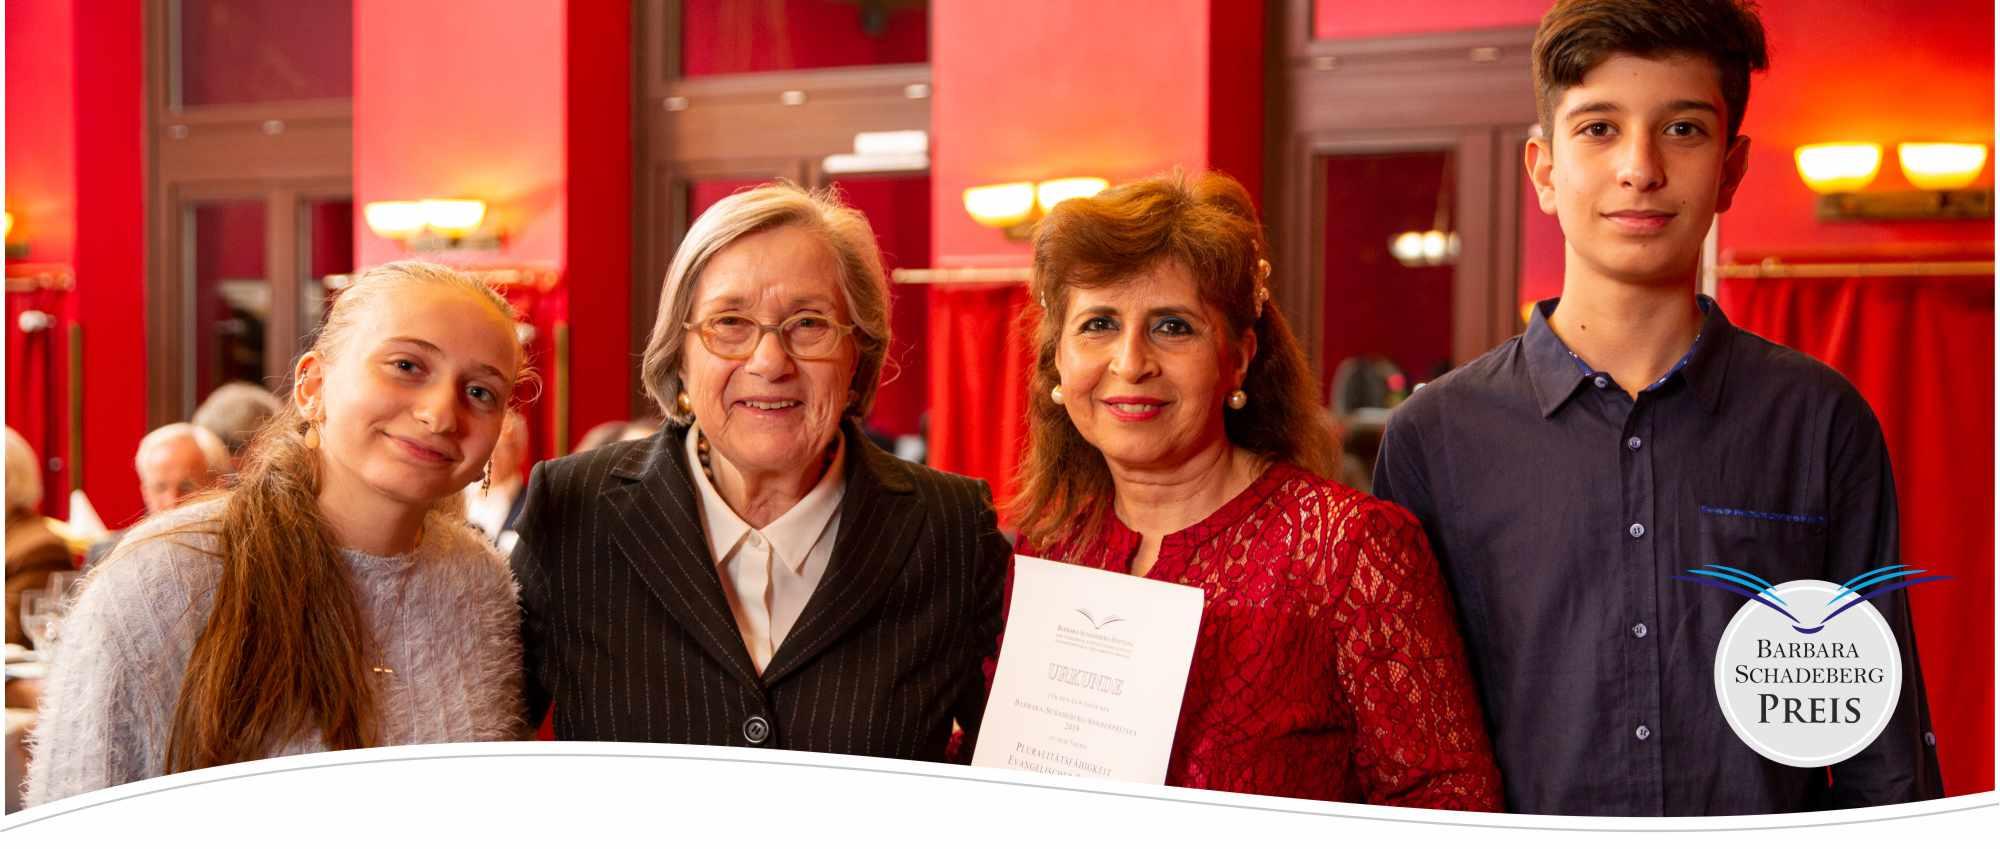 Barbara-Schadeberg-Stiftung | Sonderpreis 2019